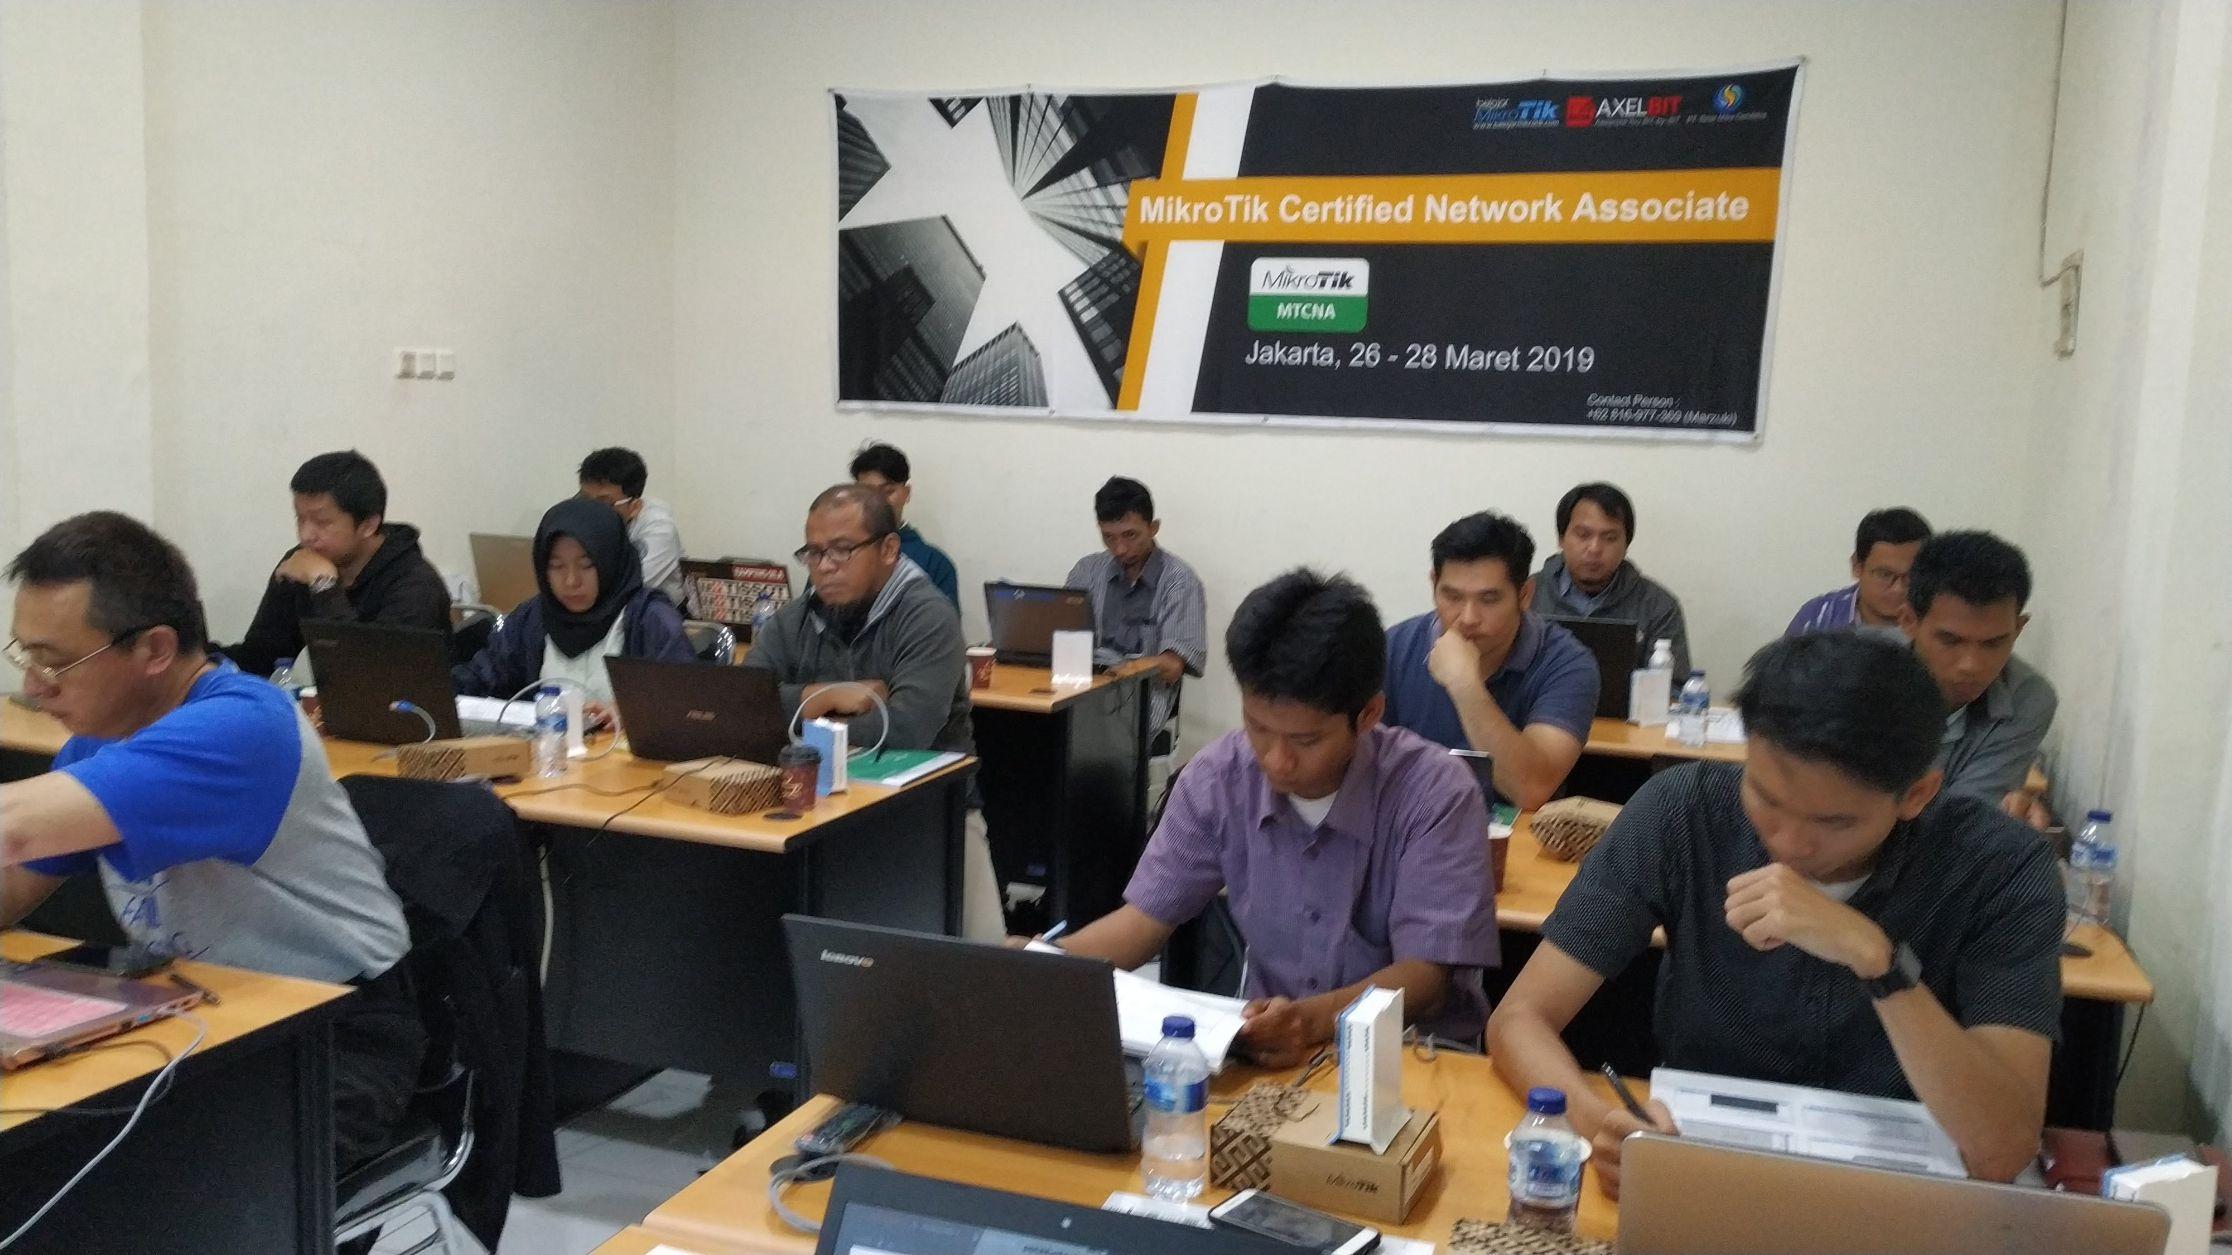 belajar, mikrotik, sertifikasi, training, IMG_20190326_105347